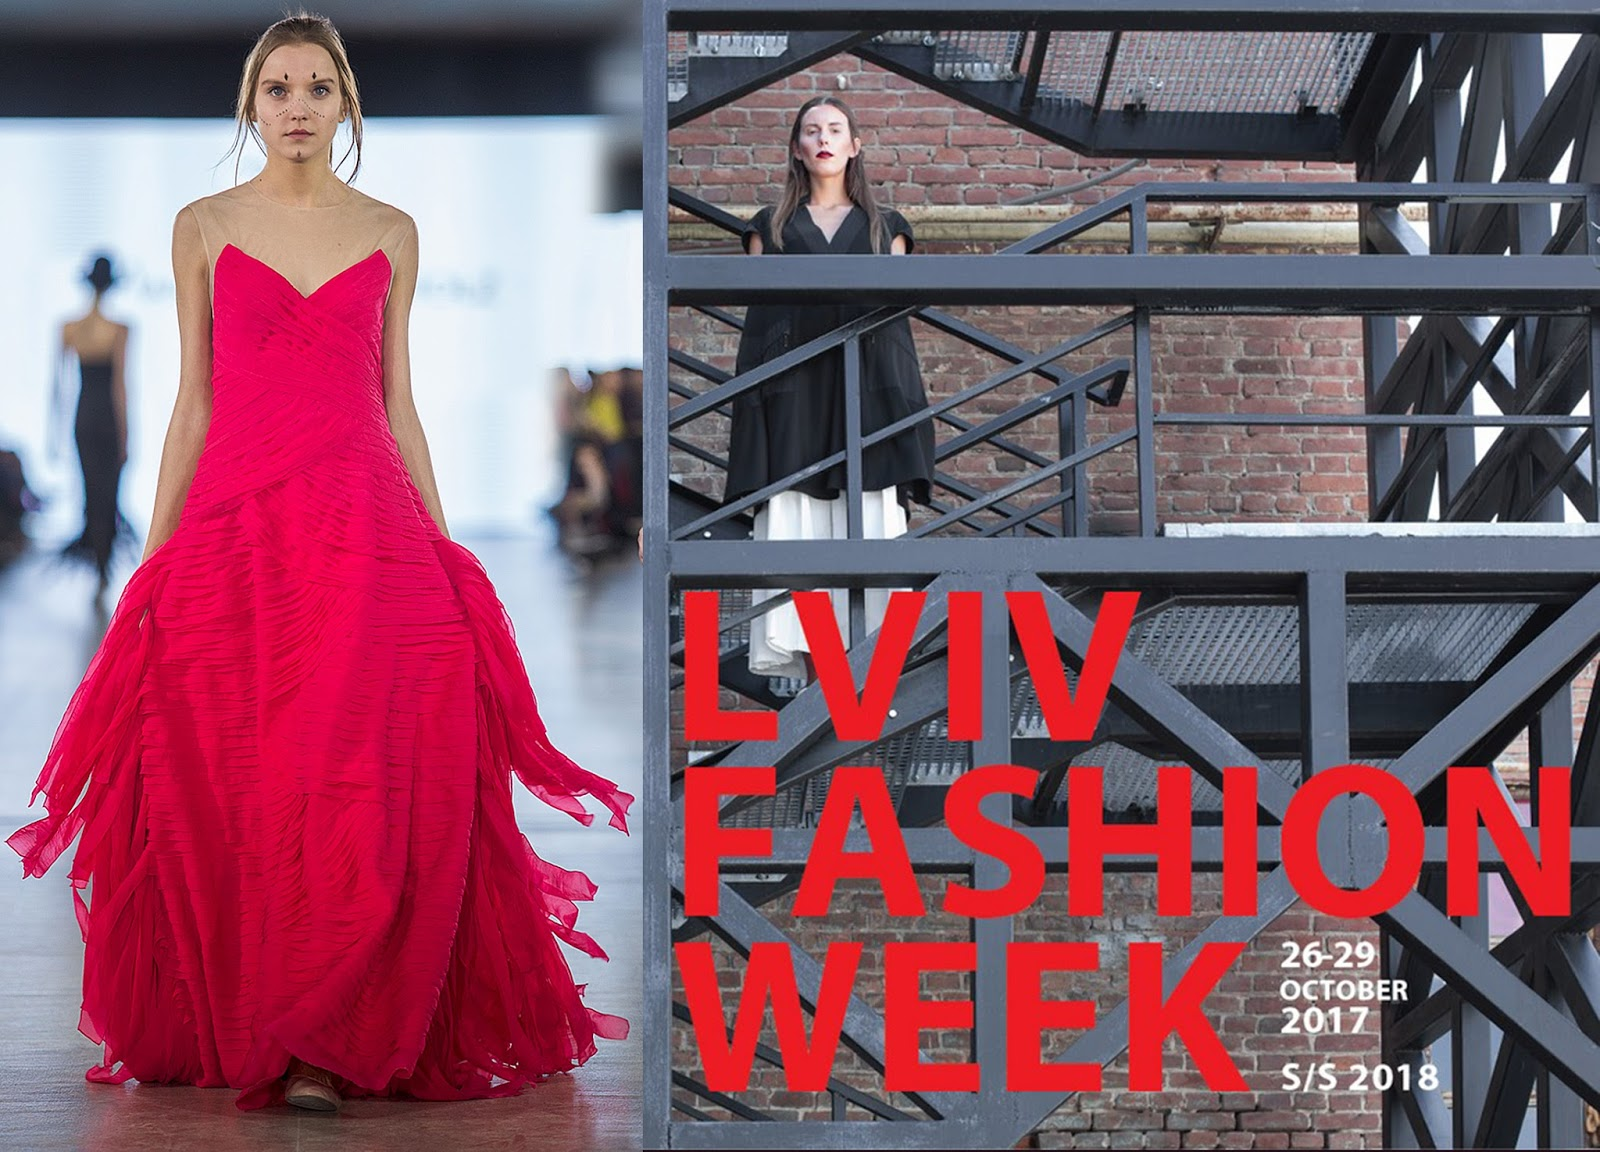 LVIV FASHION WEEK весна-літо 2018 пройде 26-29 жовтня  07e56d171a6c7